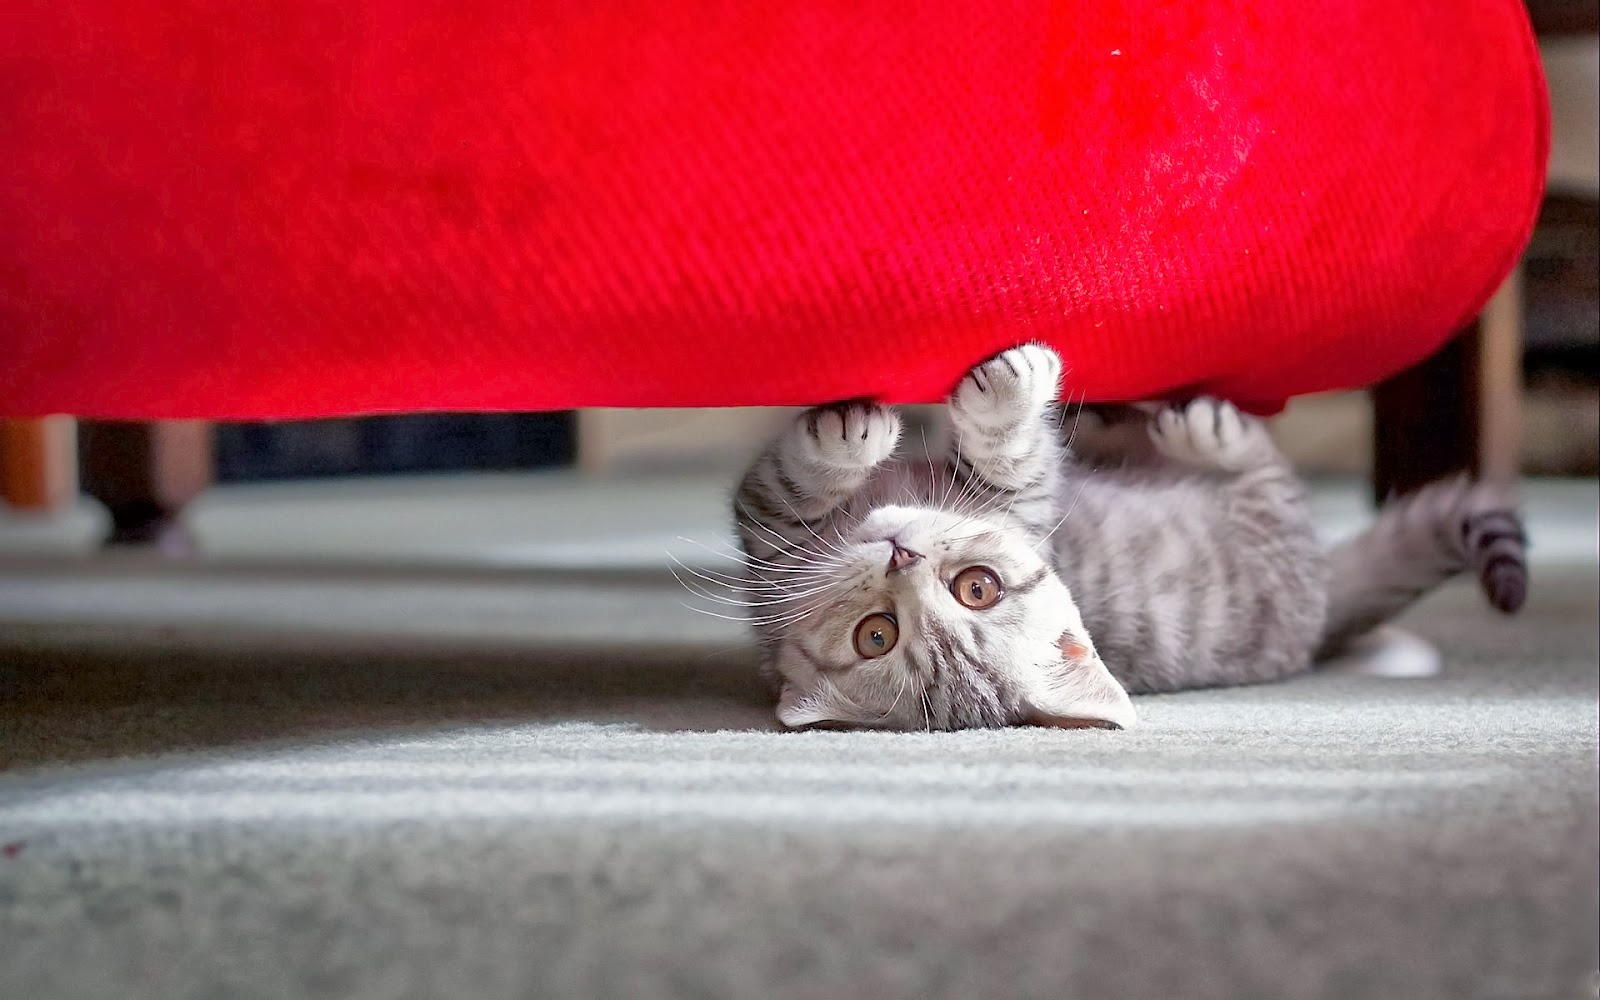 "<img src=""http://2.bp.blogspot.com/-CpWmBIynCG0/UtgFjW2O7oI/AAAAAAAAIRk/ya9UrY1dPbM/s1600/animal-wallpapers-cute-cat.jpg"" alt=""Animal wallpapers"" />"